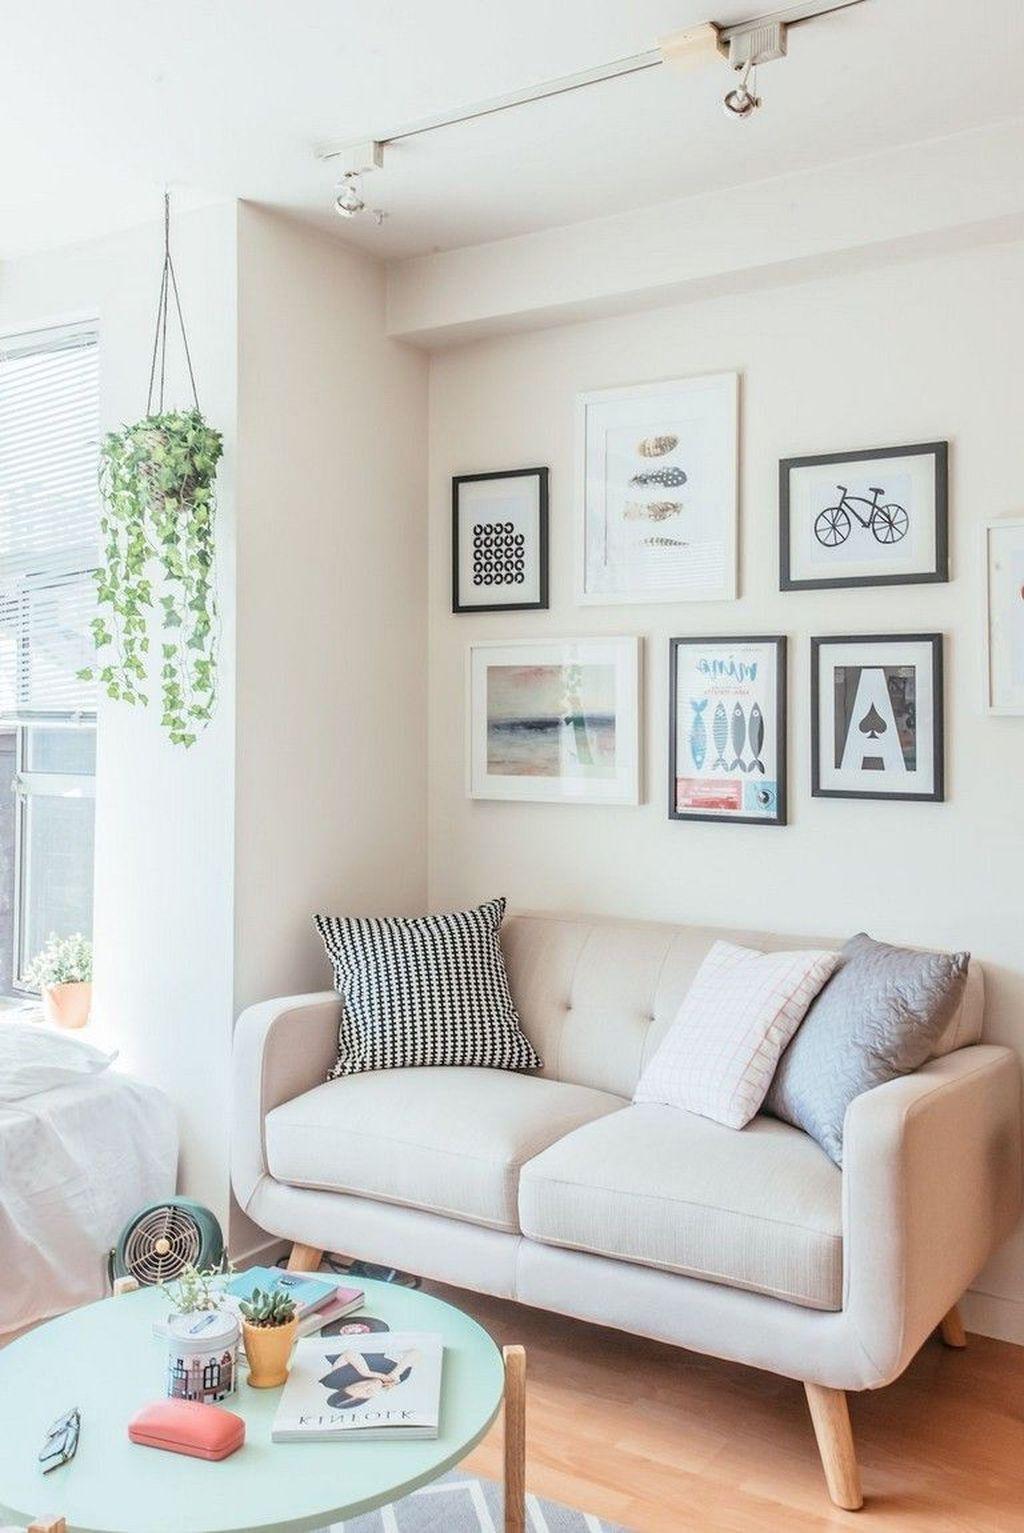 37 Minimalist Apartment Decorating Ideas On A Budget First